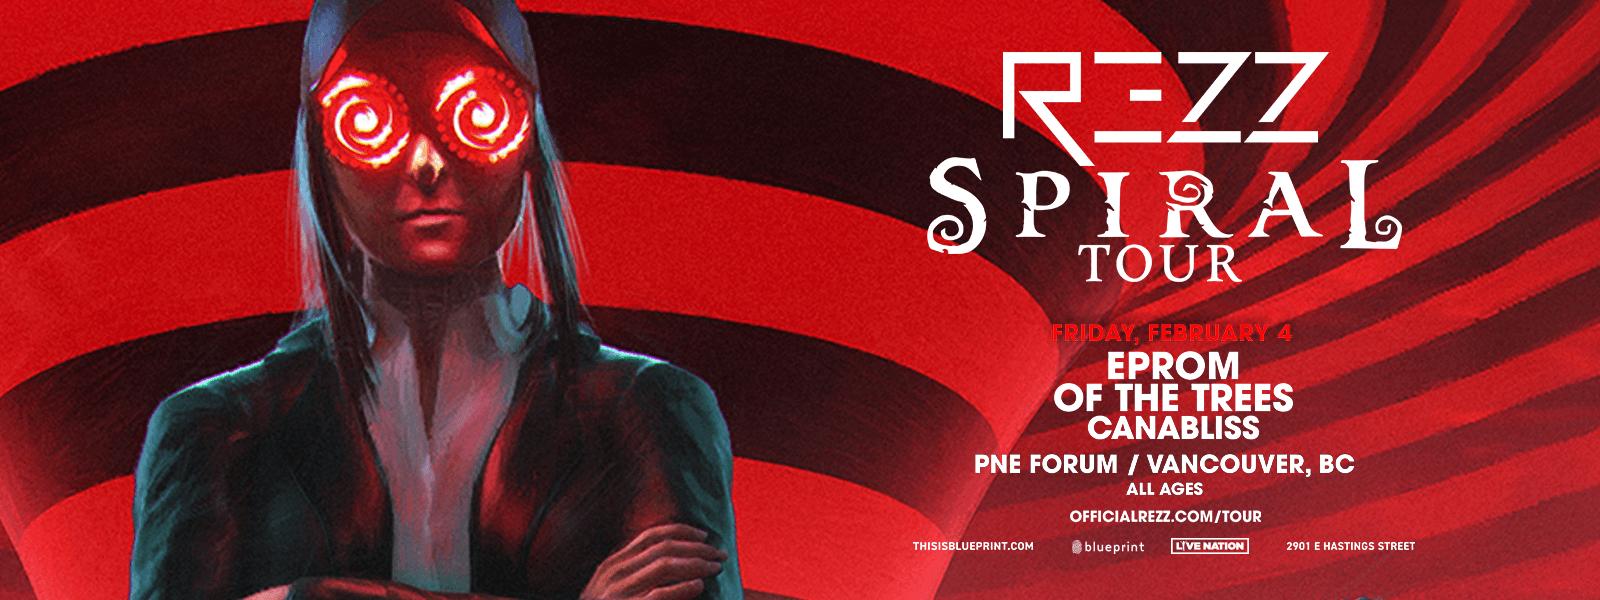 Rezz - Spiral Tour